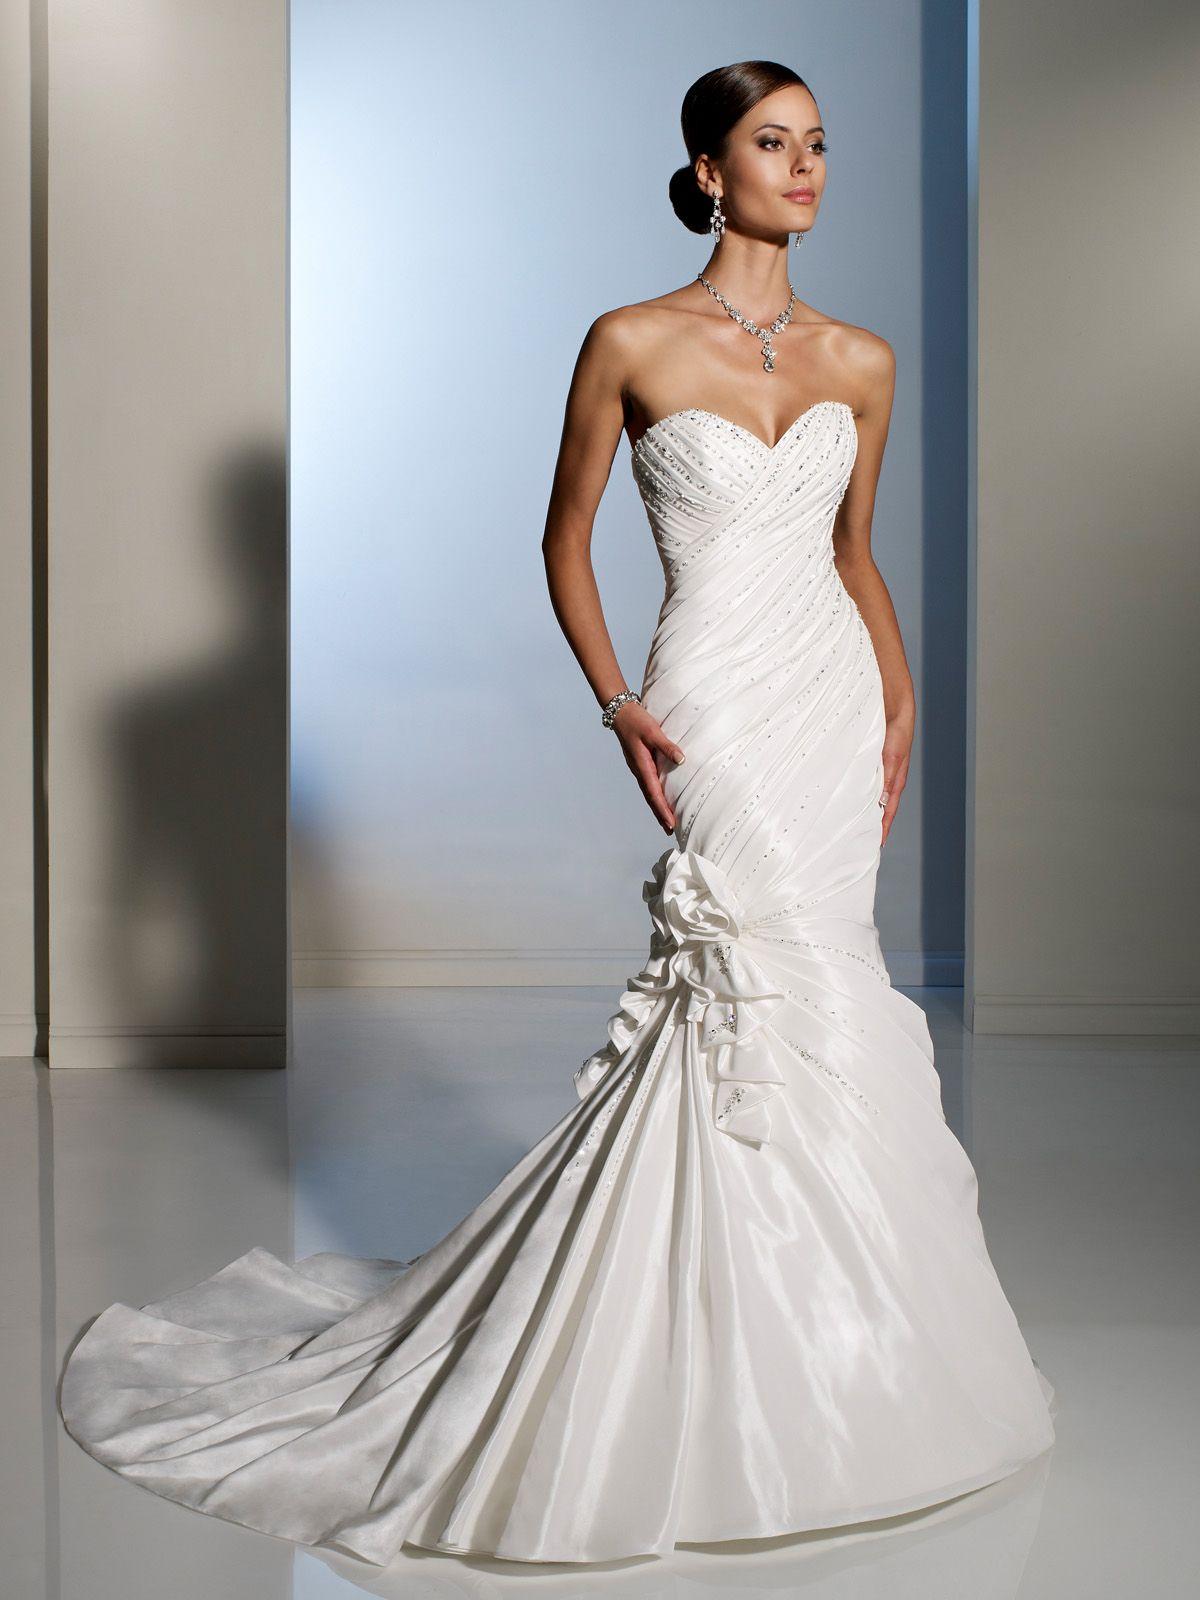 Top Wedding Dress Designers List | Designer Wedding Dresses ...